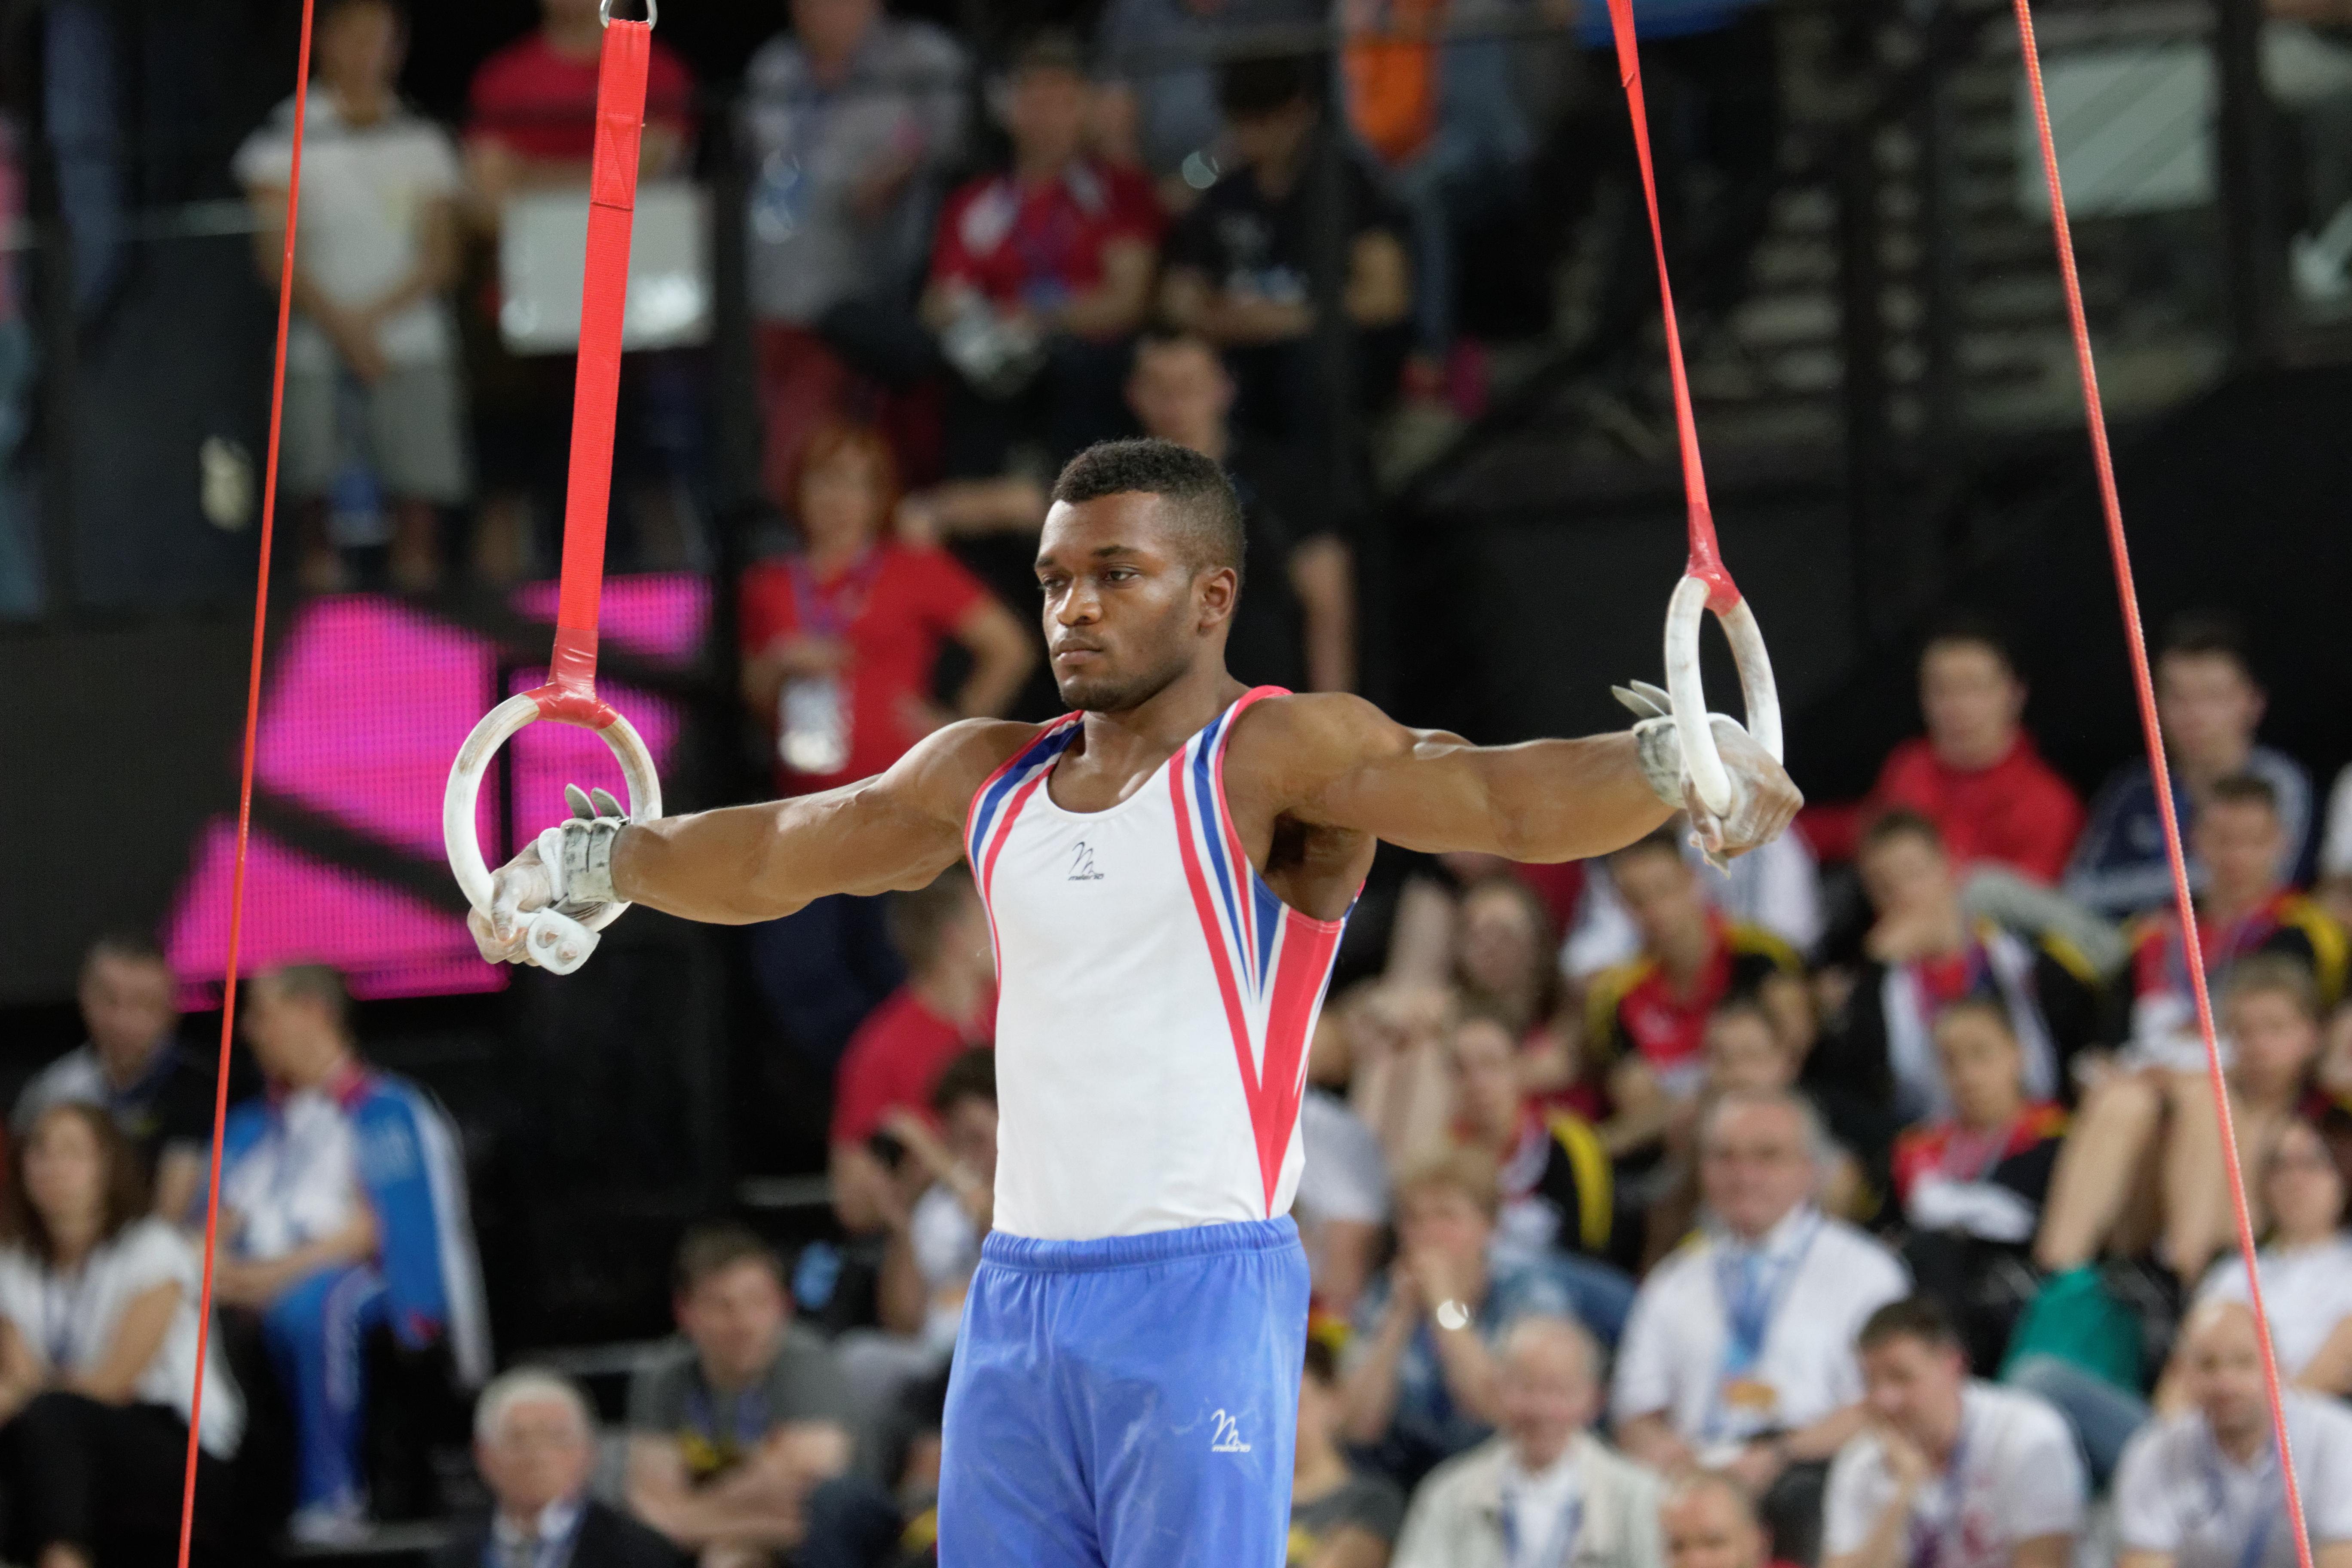 Mens Rings Gymnastics Moves